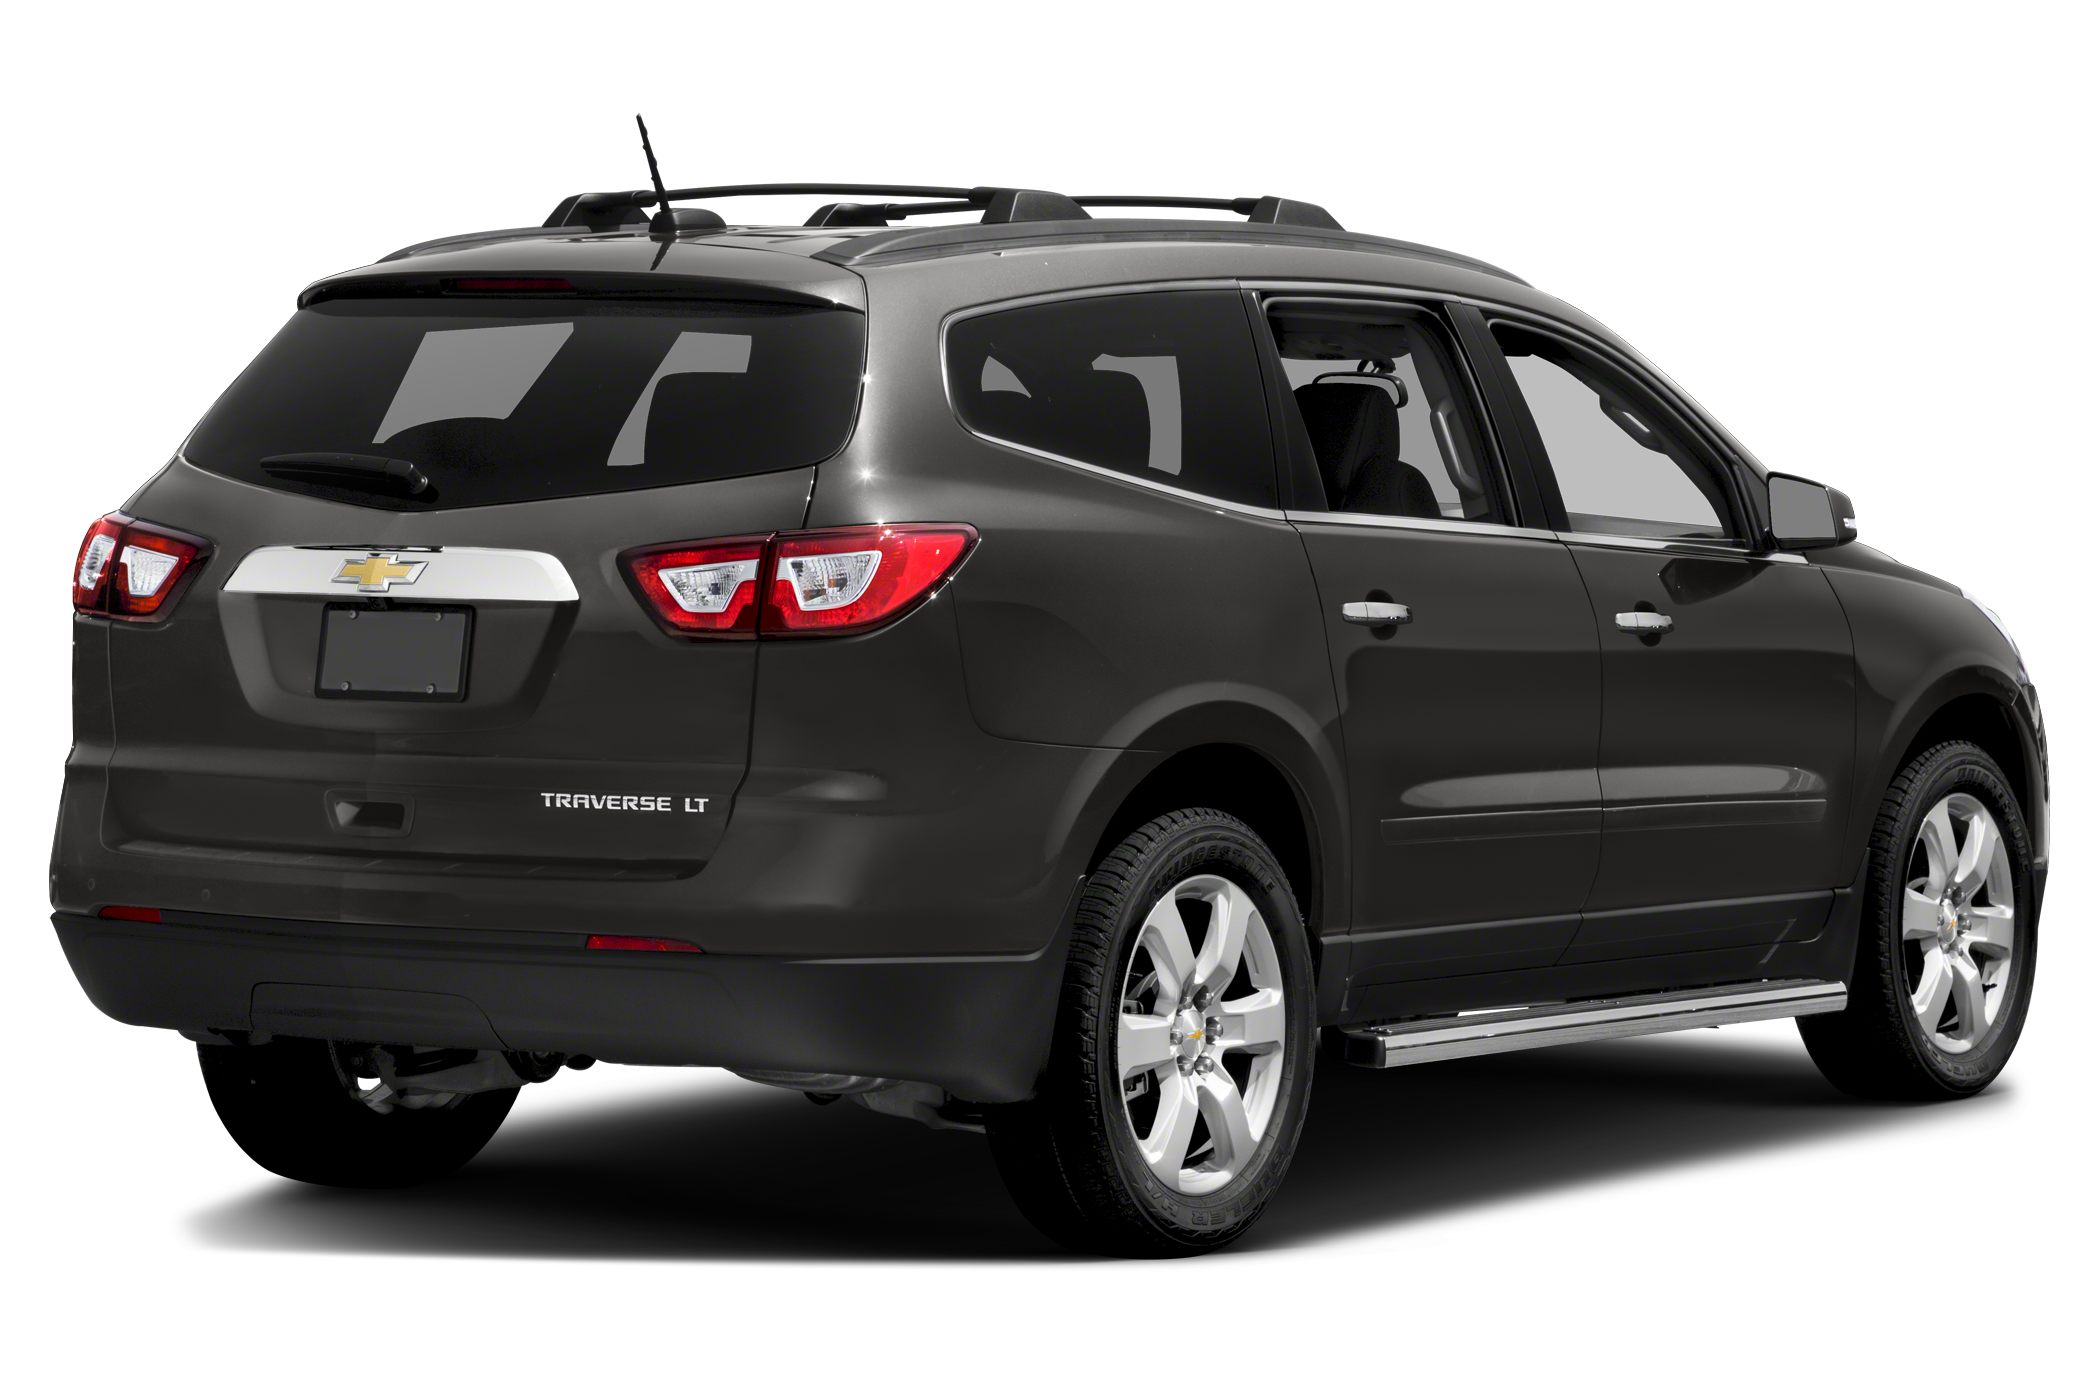 2017 Chevrolet Traverse Reviews, Specs and Prices | Cars.com